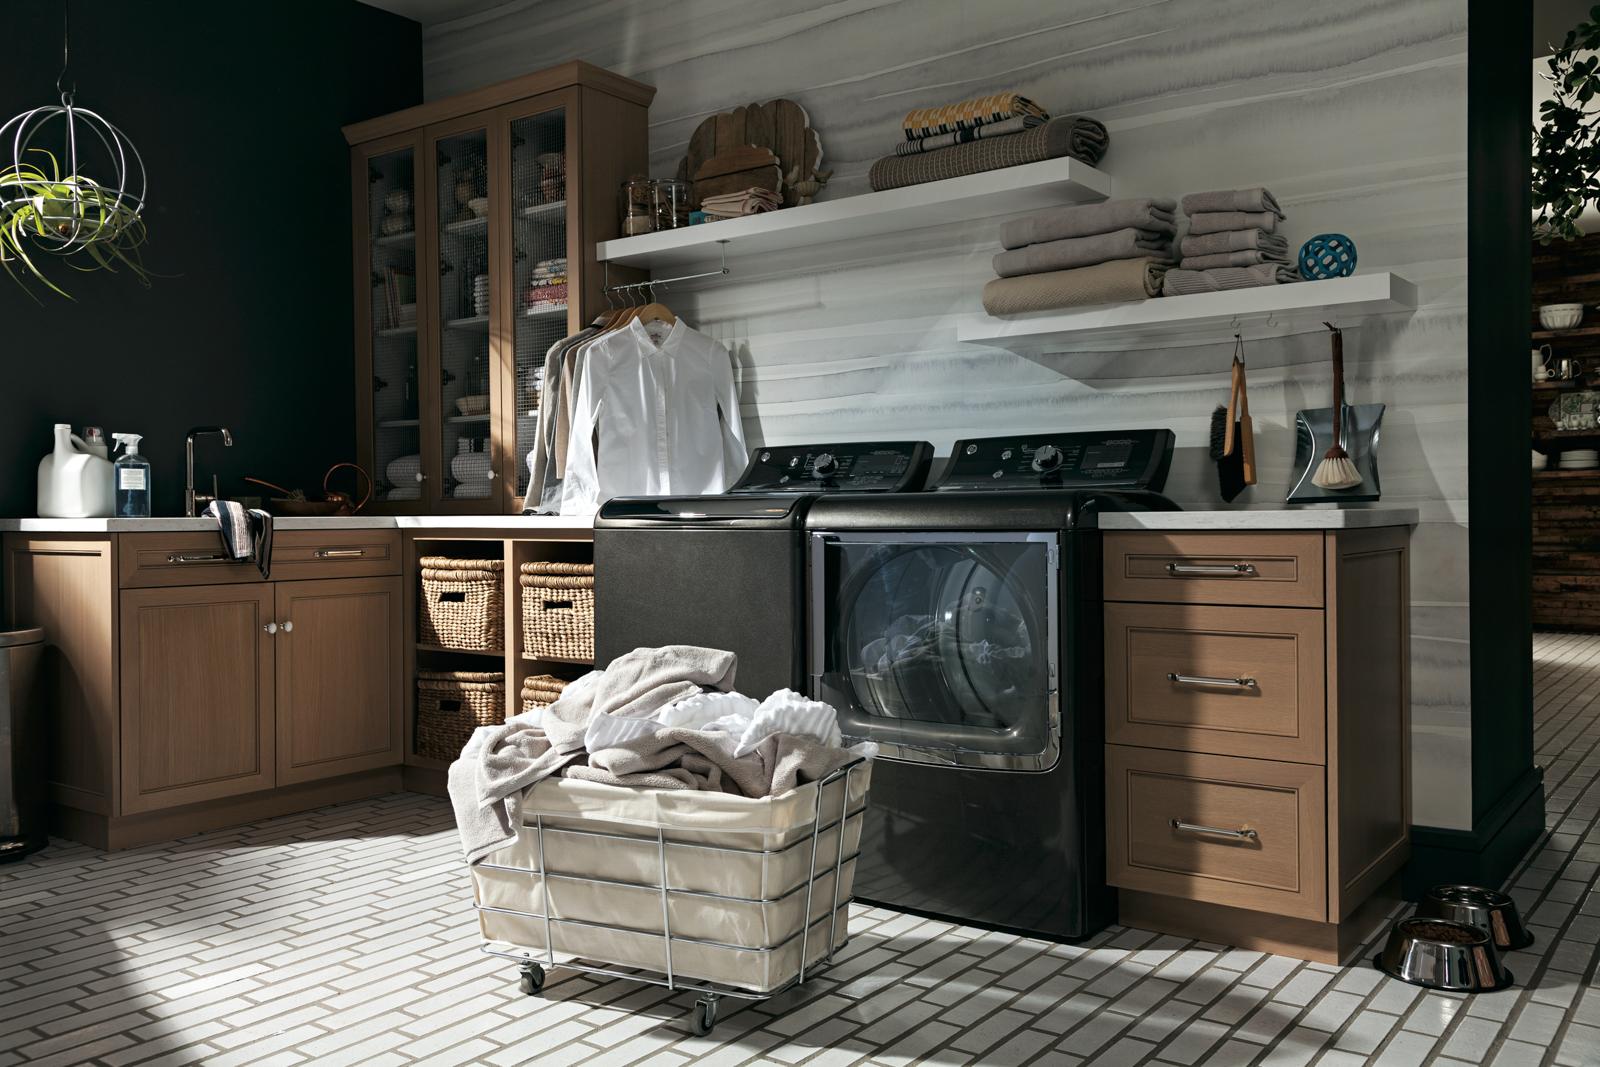 Brick__Cotton__GE_Appliances-Power_Creative__Laundry.jpg